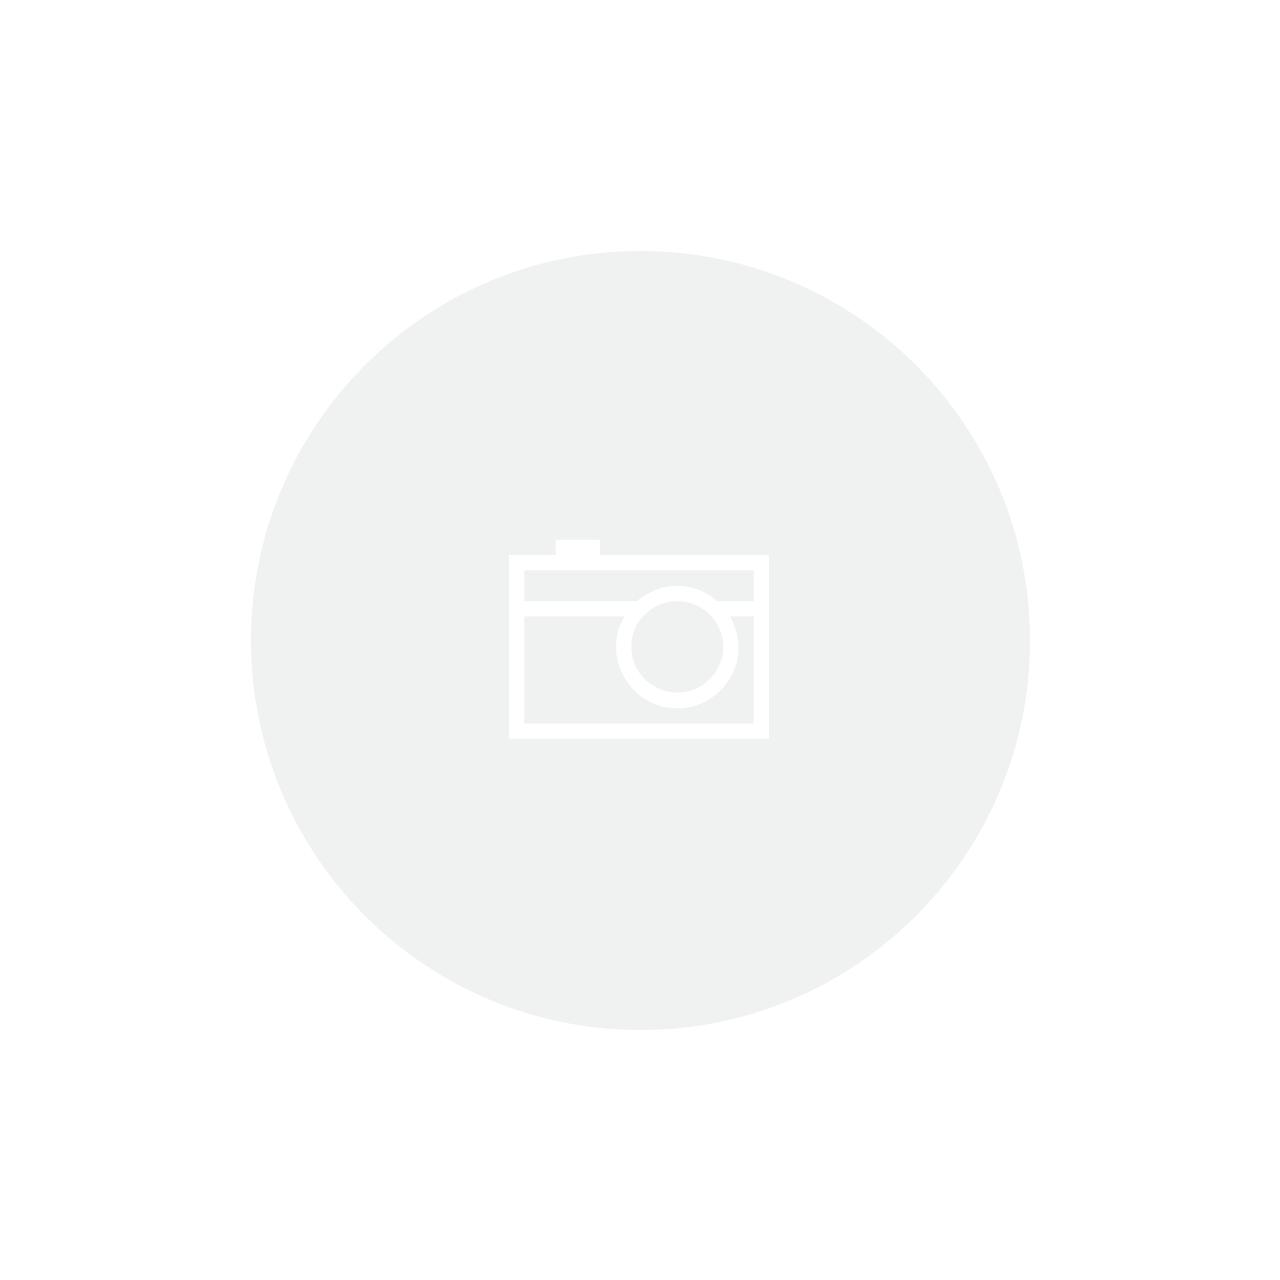 Fôrma para Torta e Bolo Antiaderente 24 cm Brasil Tramontina